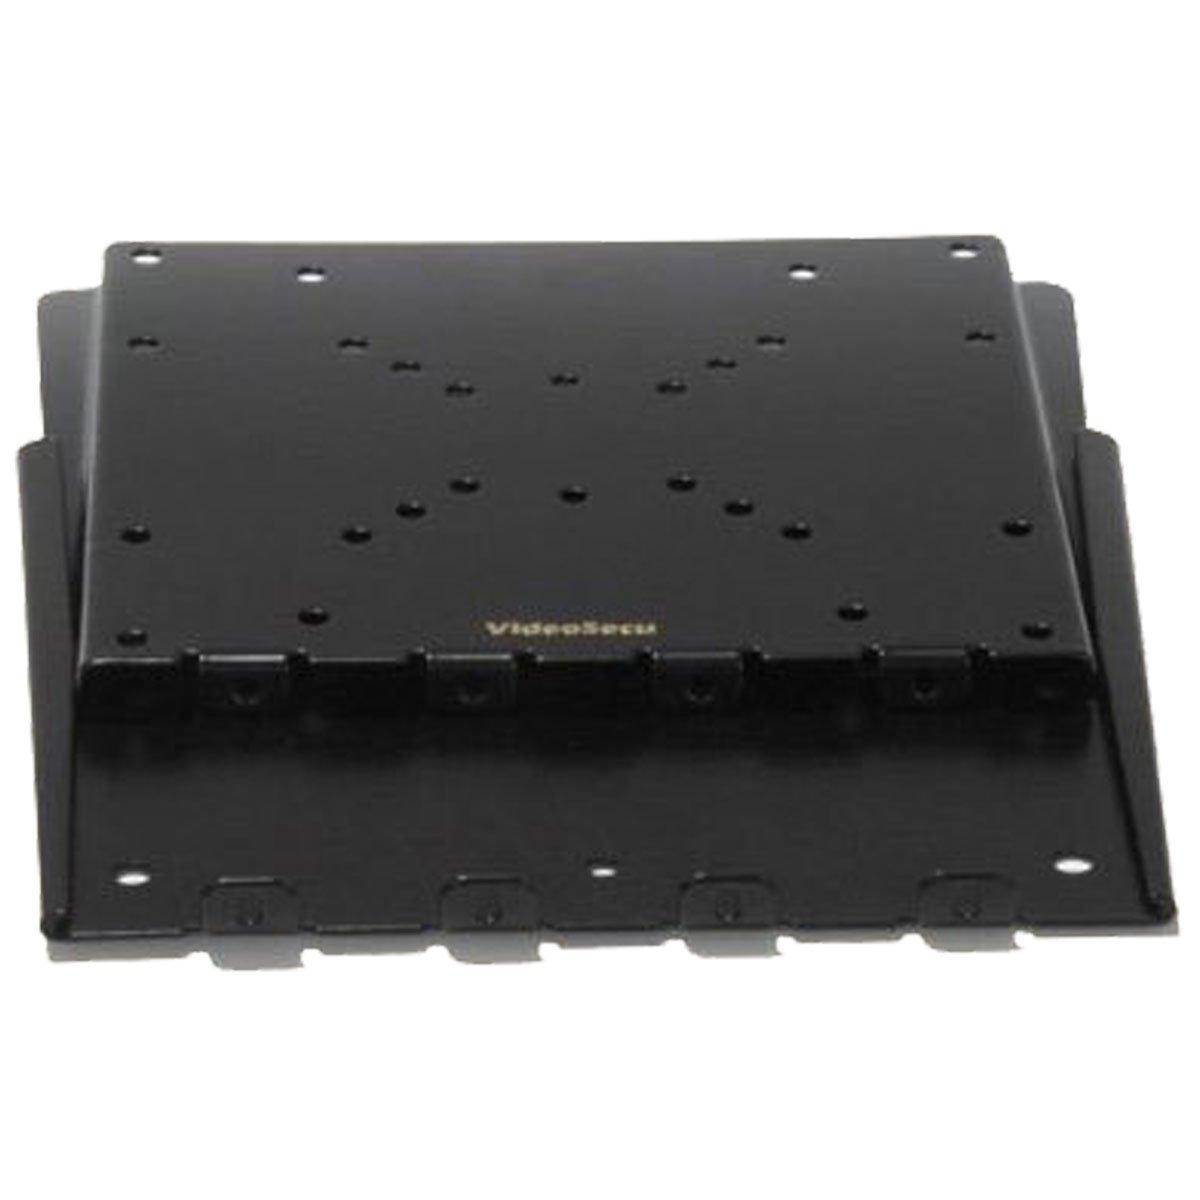 "VideoSecu Mounts Ultra Slim TV Wall Mount for Sharp AQUOS 26"" 32"" LC-26DV22u LC-26DV22u-W LC32AV22u LC32D53X LC-32DV22u LC-32D40U LC-32SB24U,LC-32SB220U LC-32SB23U LC32D62U LED TVs Displays ML206B 1QG"